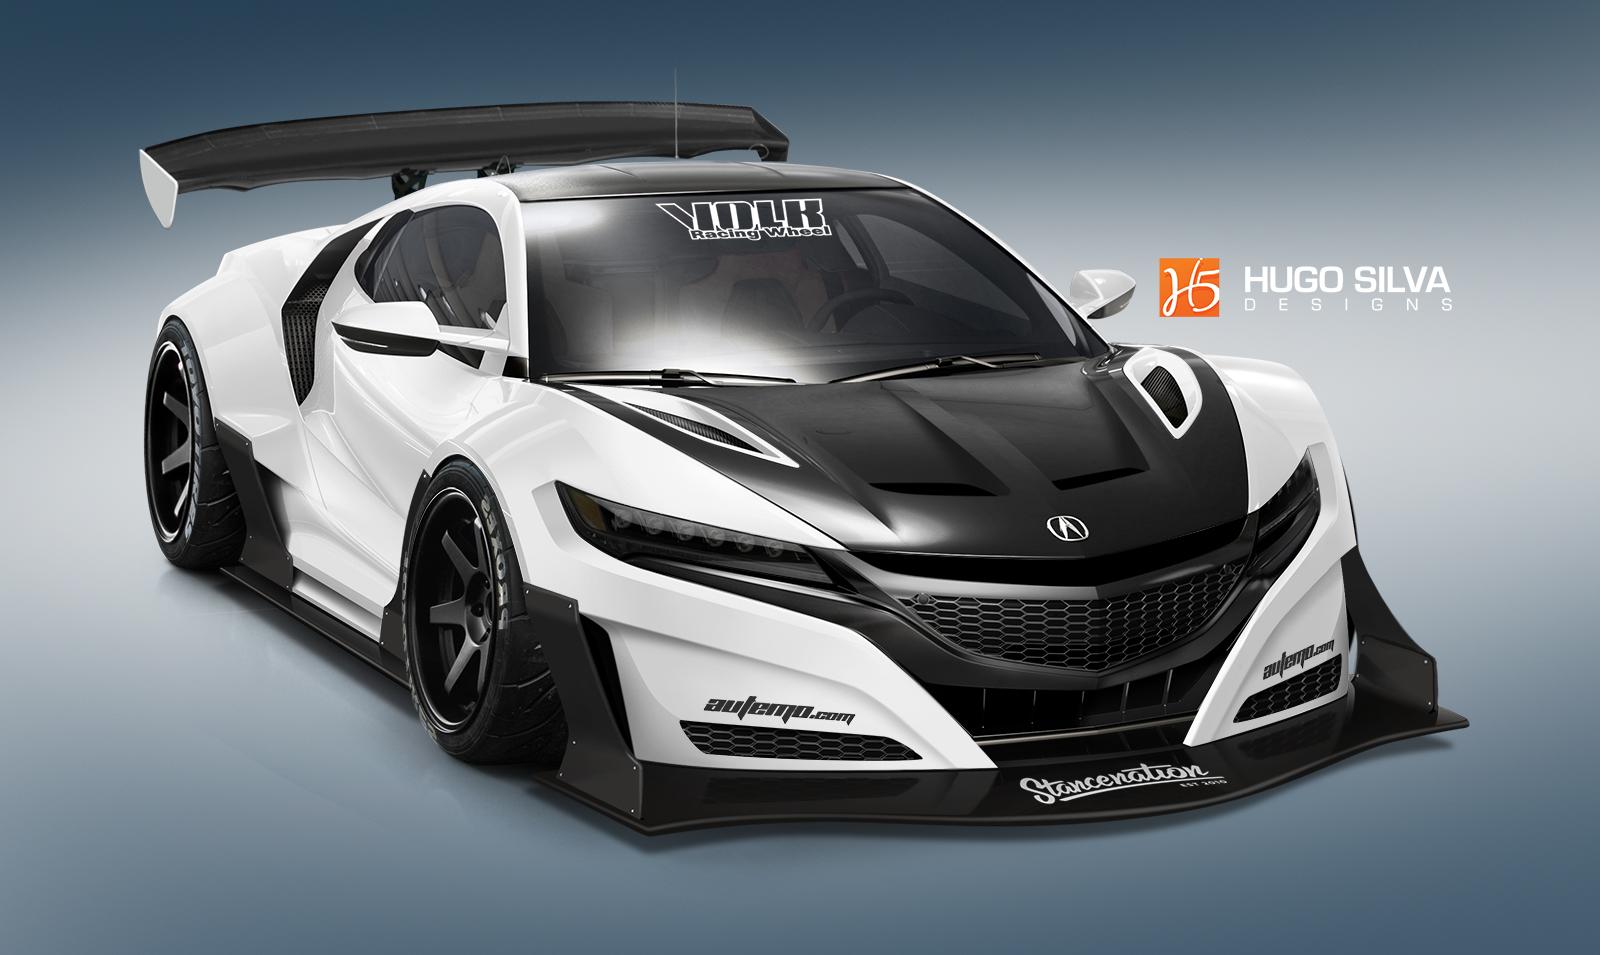 Custom 2016 Acura NSX StanceNation Form Gt Function